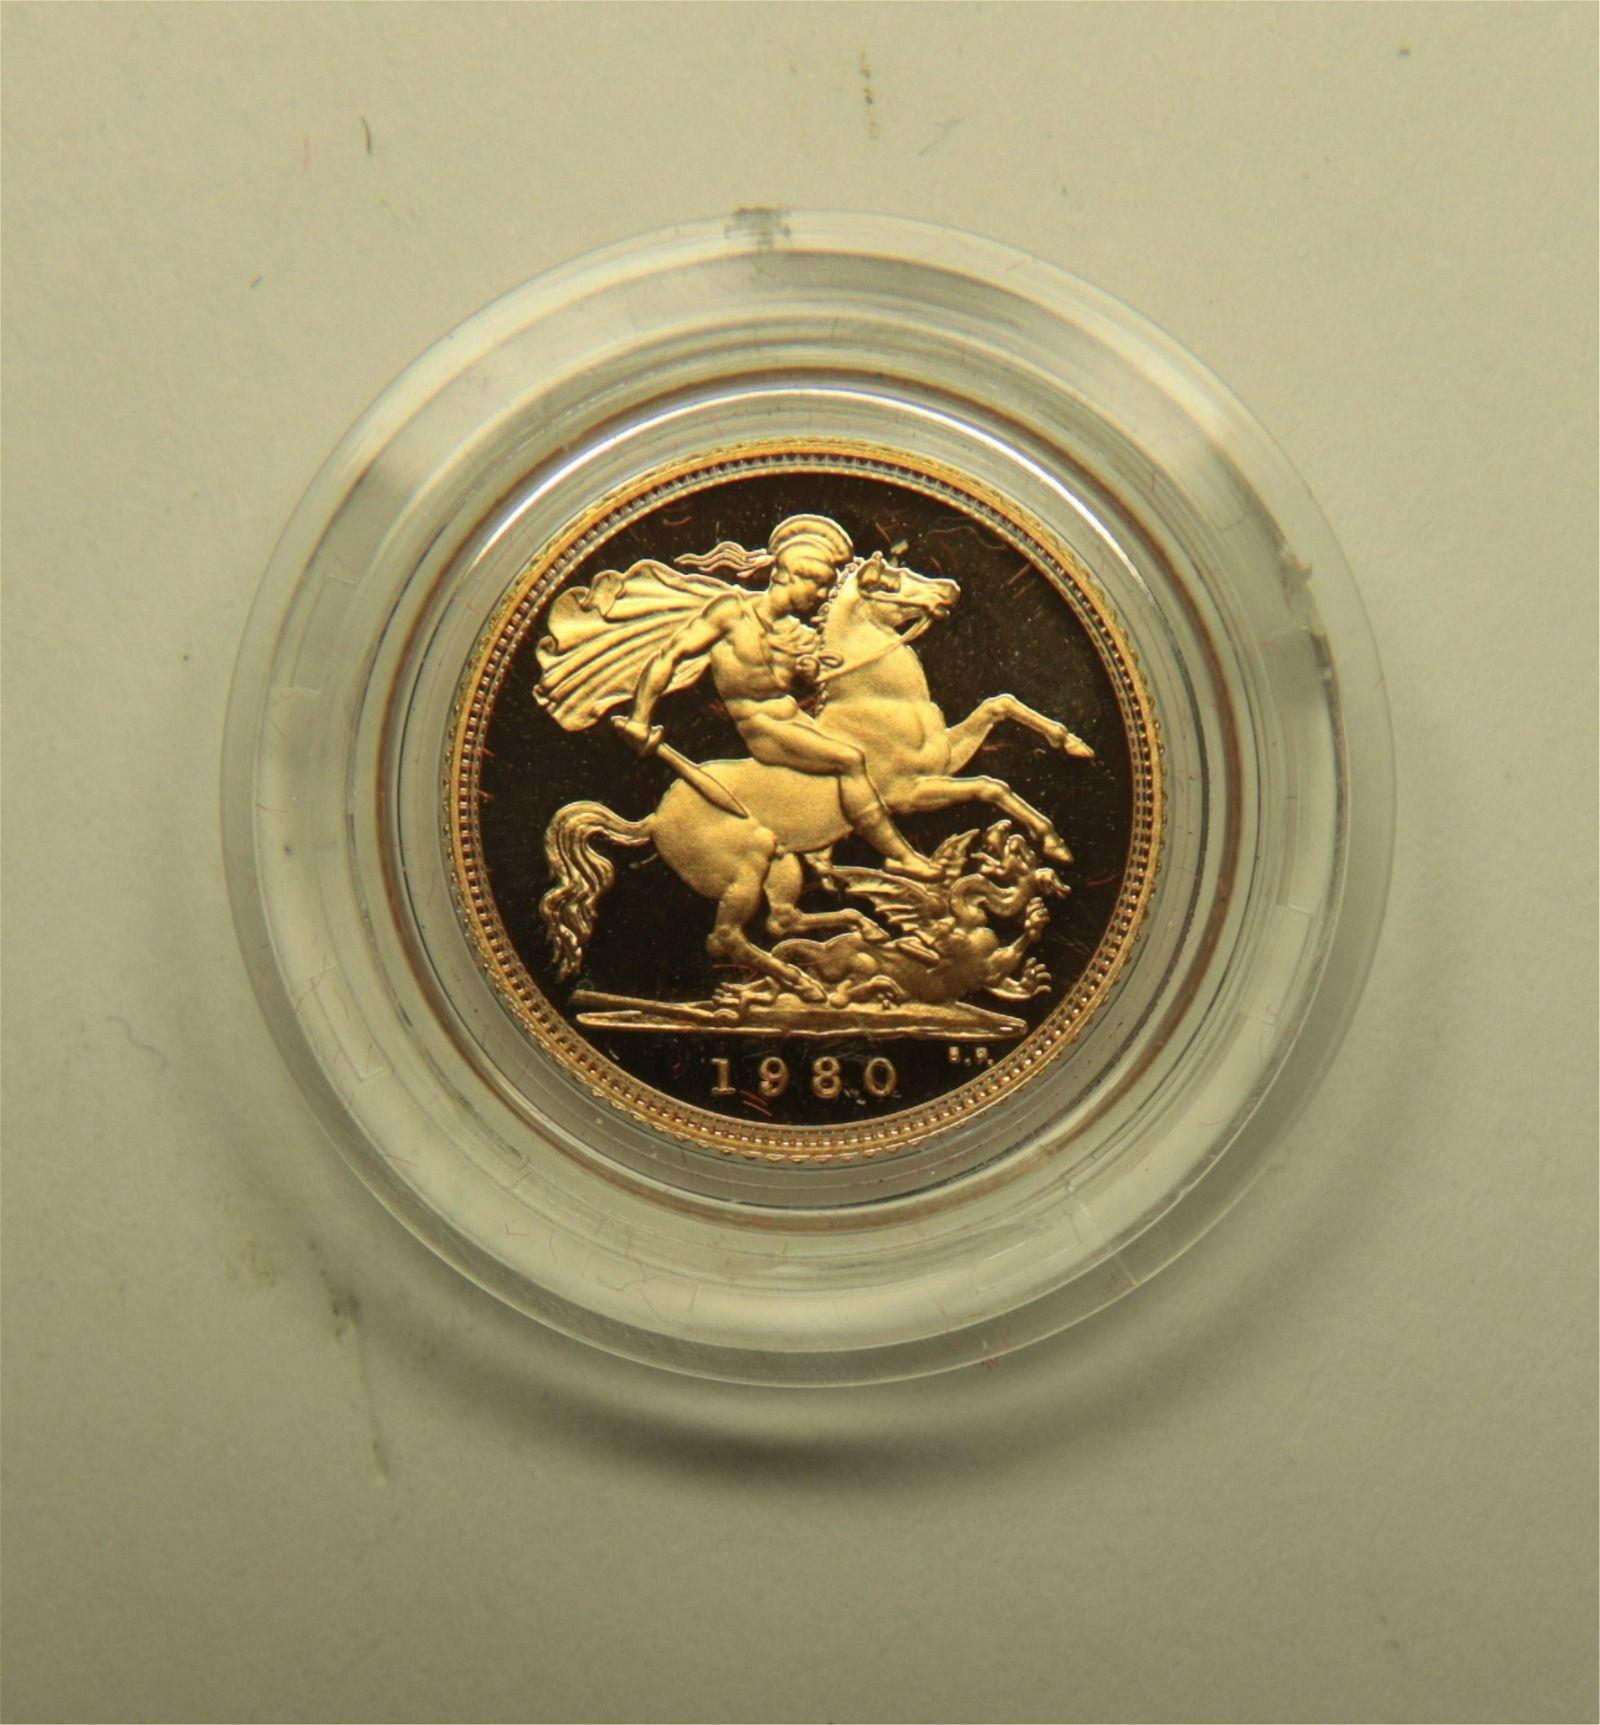 United Kingdom 1980 Half Sovereign Gold Coin